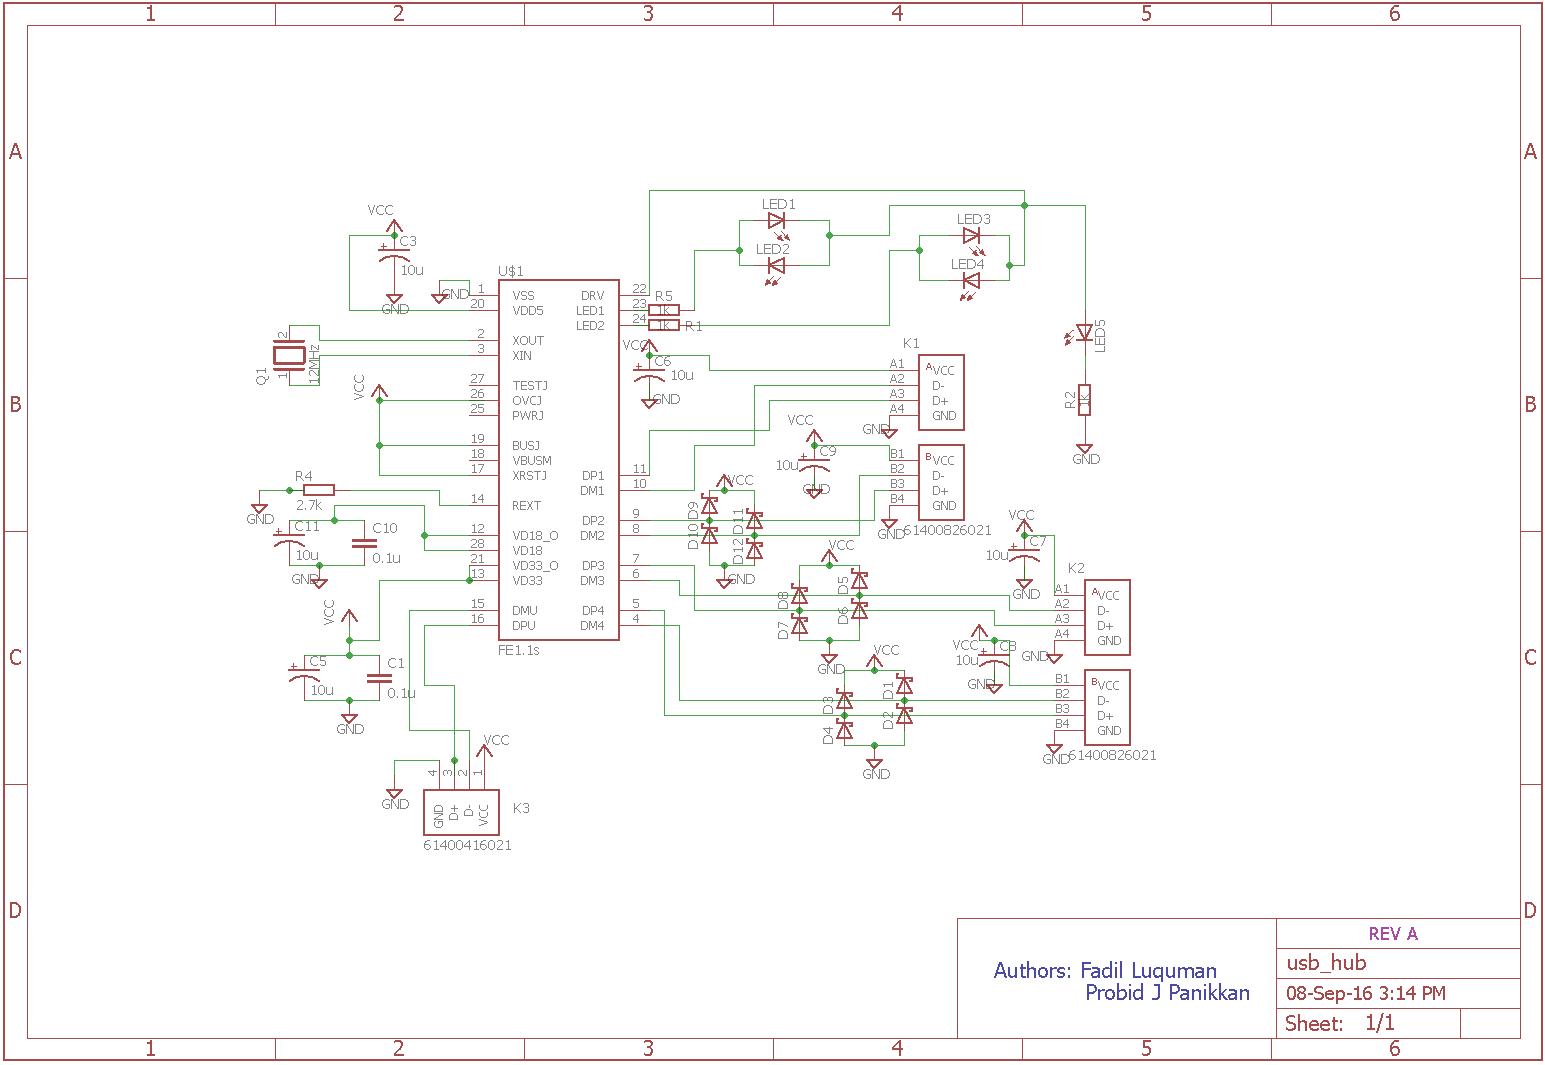 usb hub schematic design